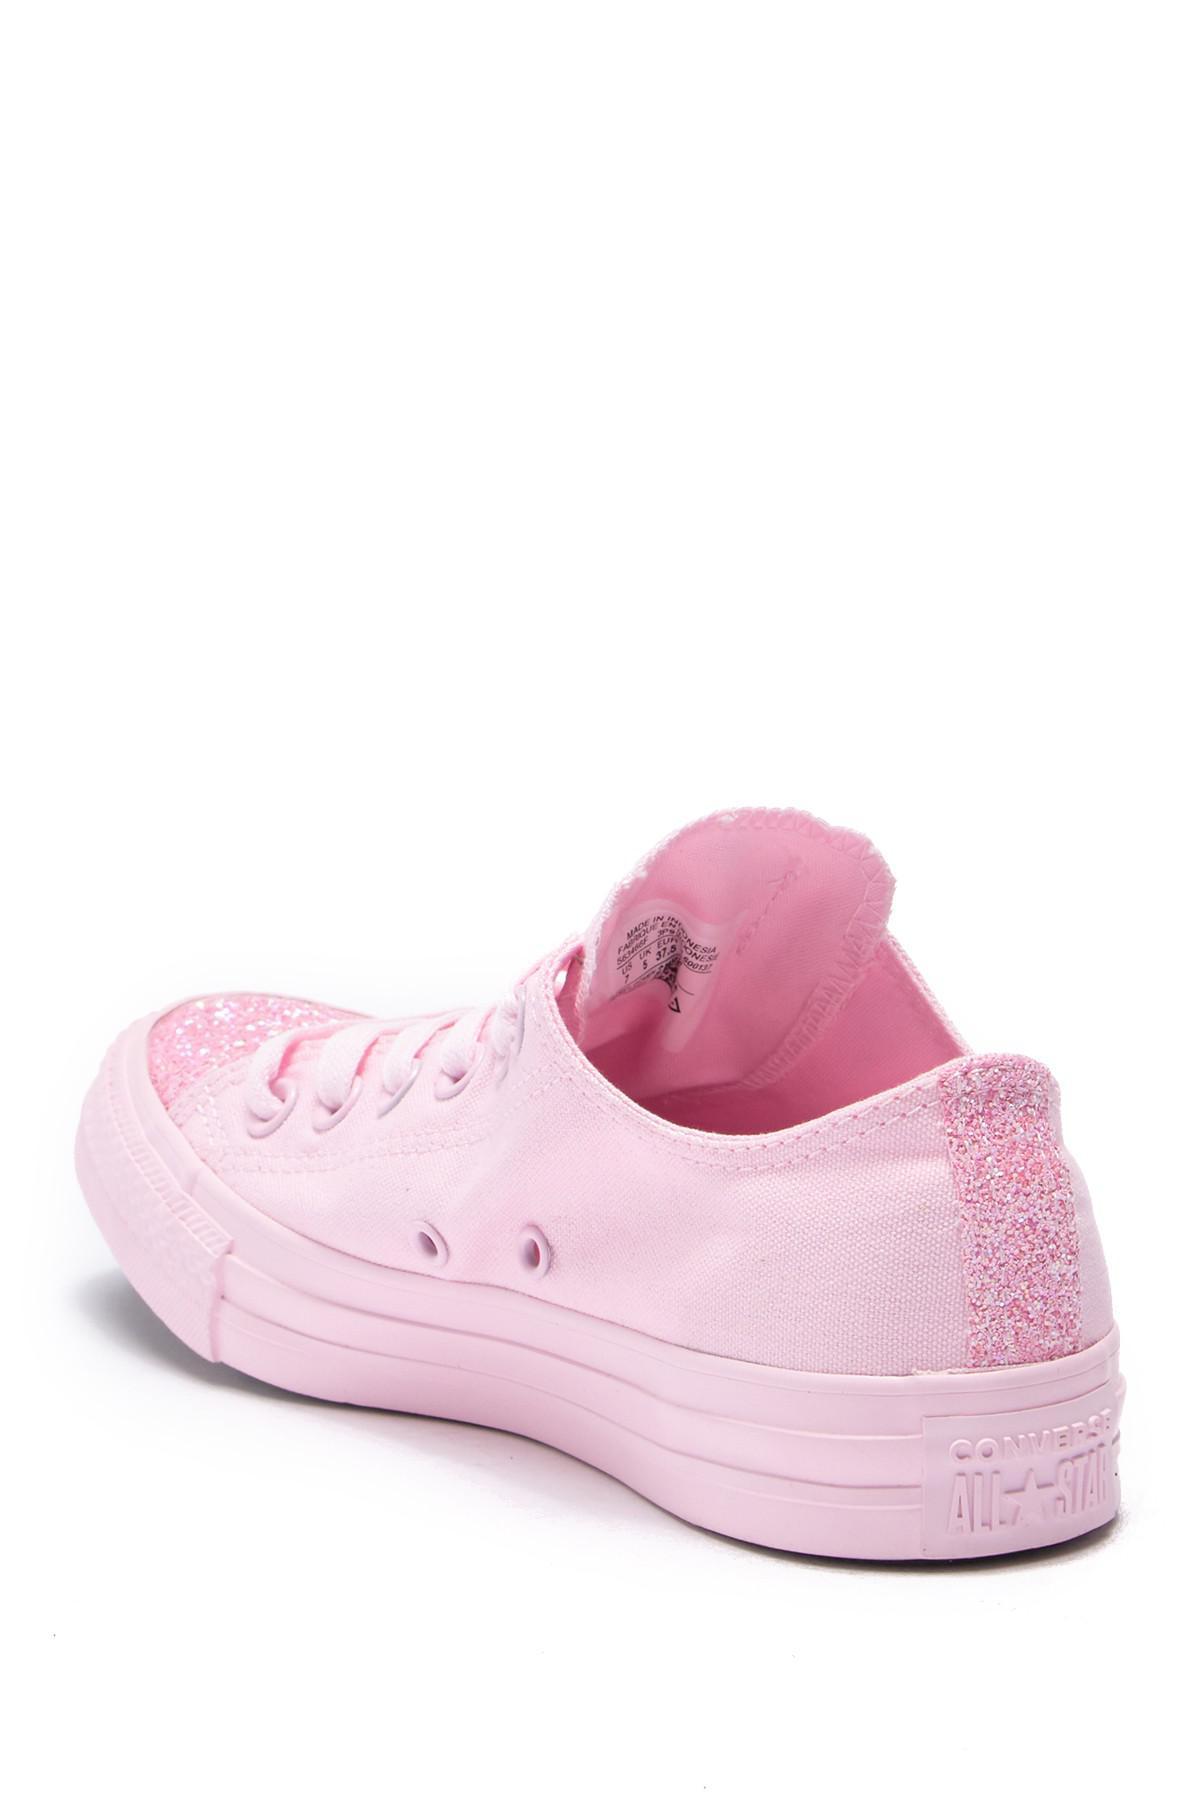 663af38e793f55 Converse - Pink Chuck Taylor All Star Ox Glitter Toe Sneaker (women) -  Lyst. View fullscreen